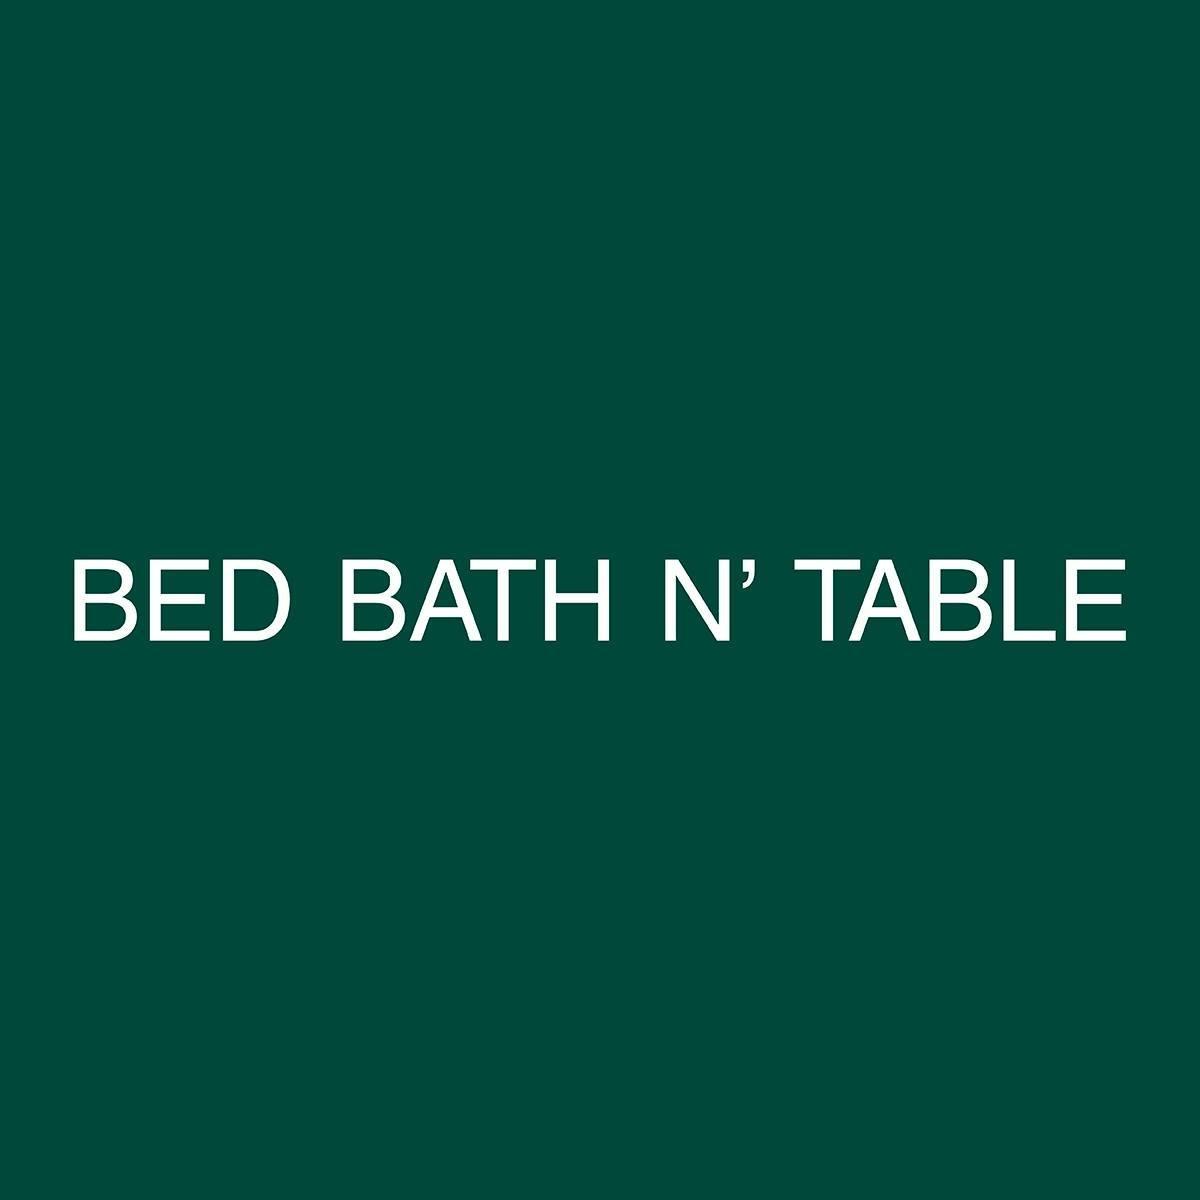 bed-bath-n-table-logo